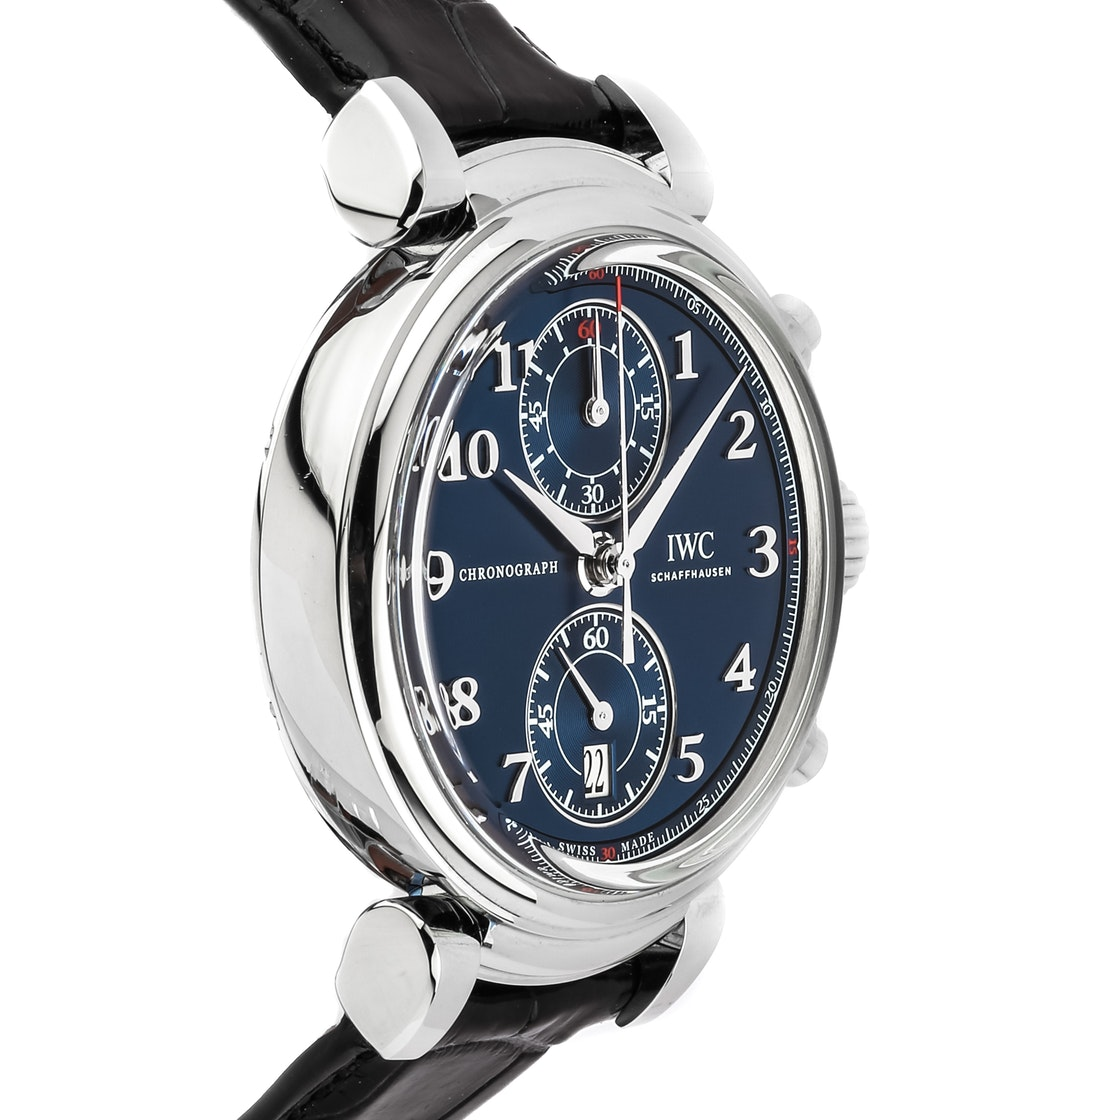 IWC Da Vinci Chronograph Laureus Limited Edition IW3934-02